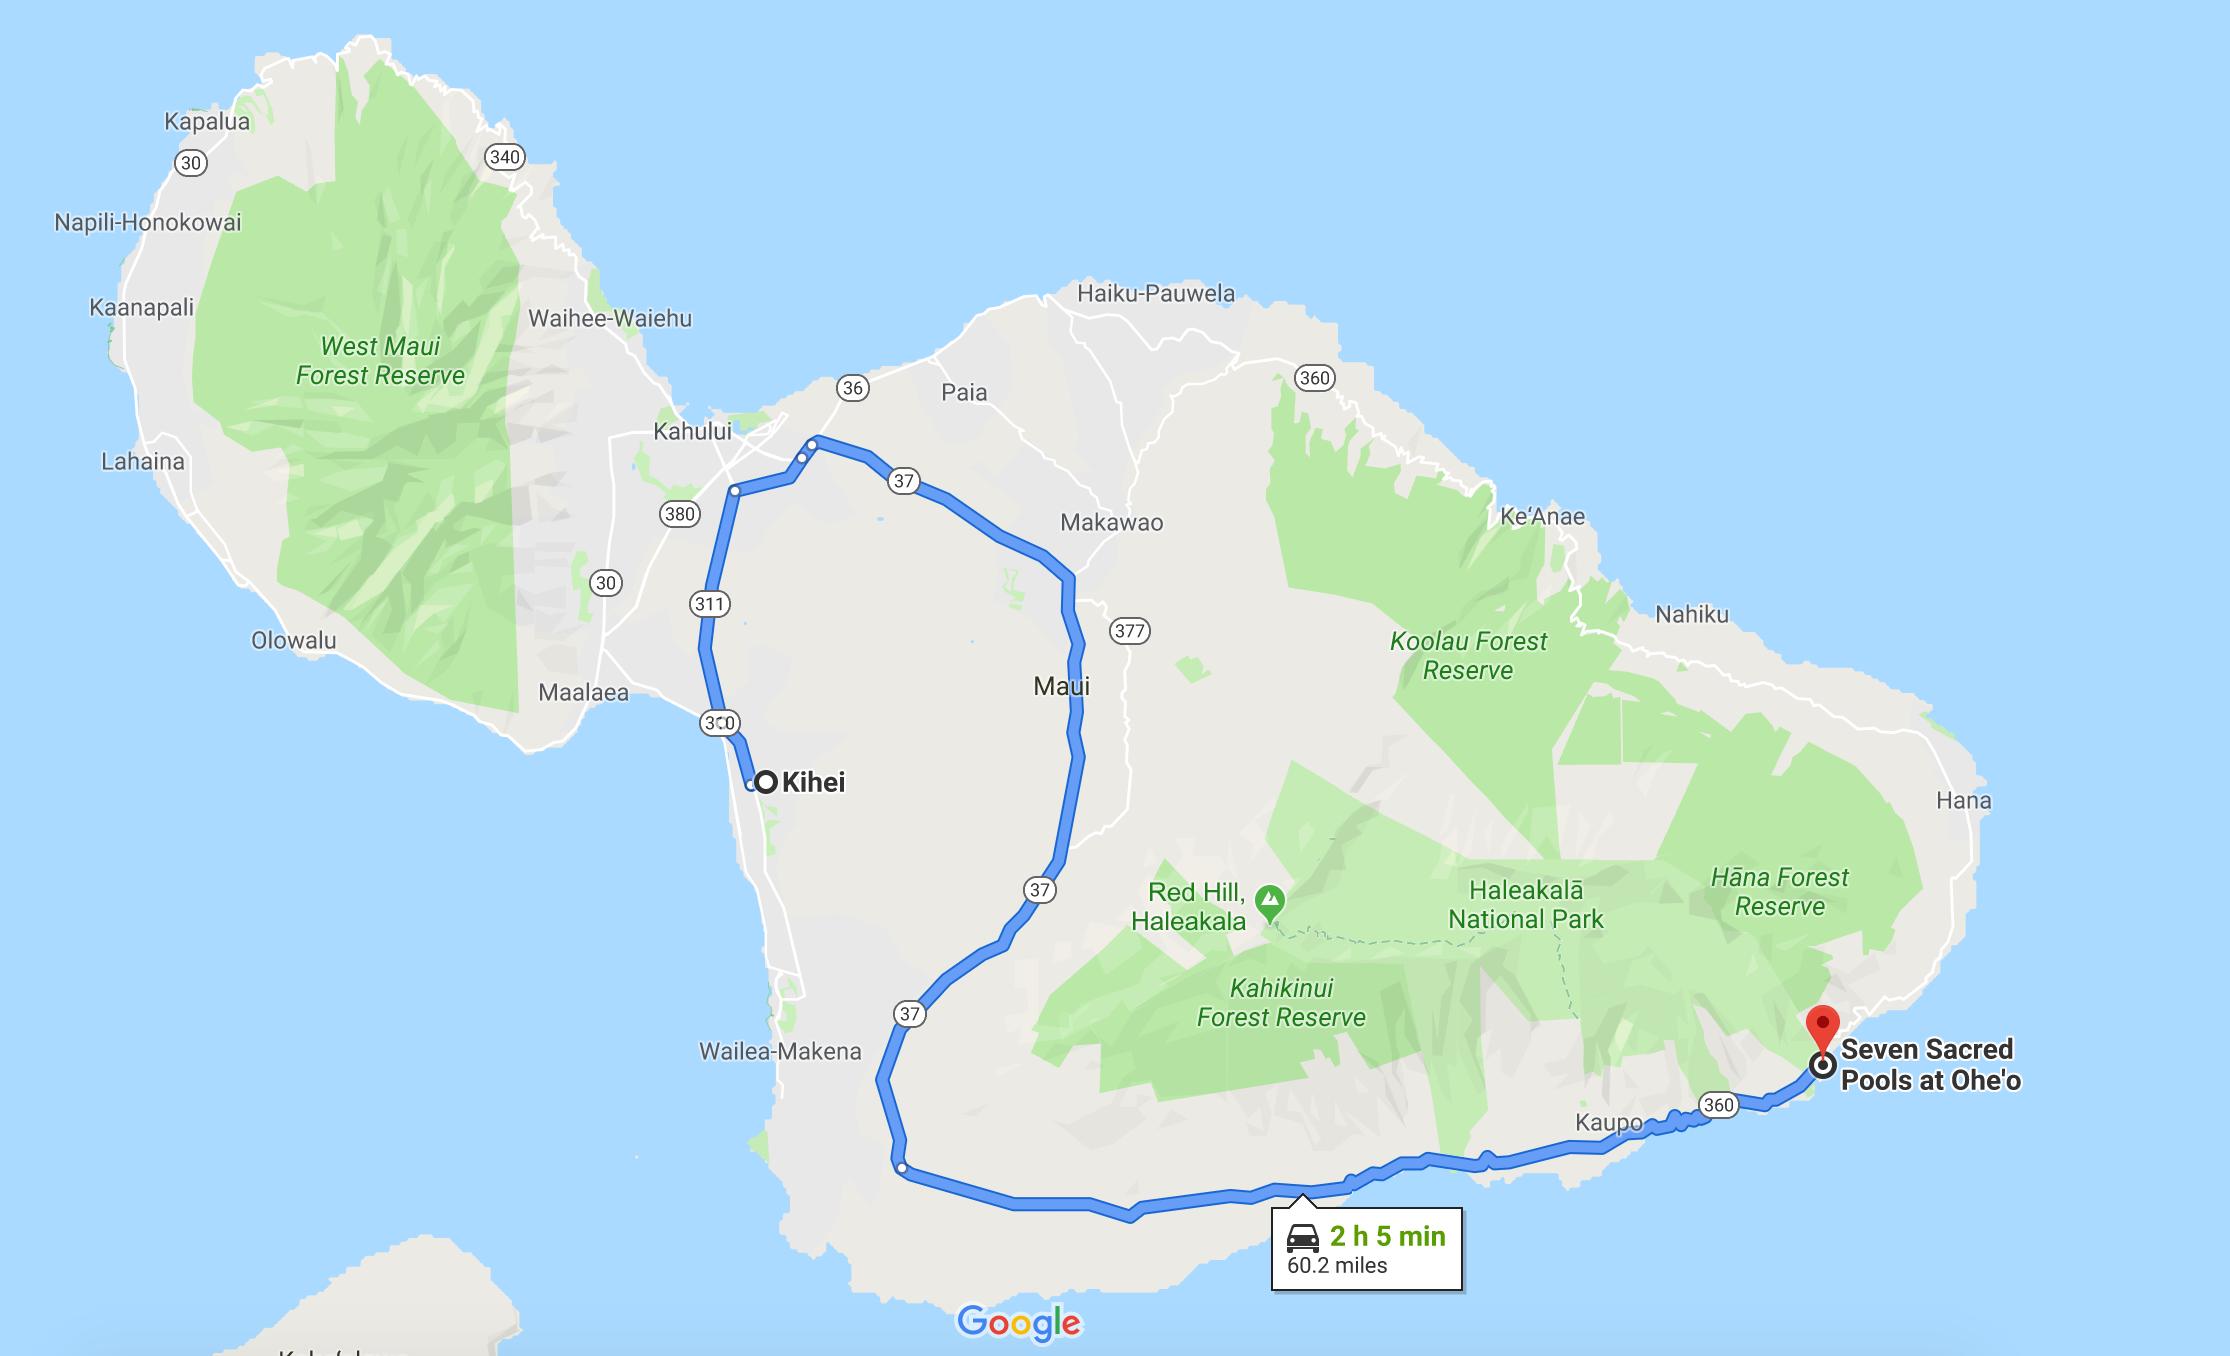 The Road to Hana: The Road Less Traveled   sarahmartinhood.com